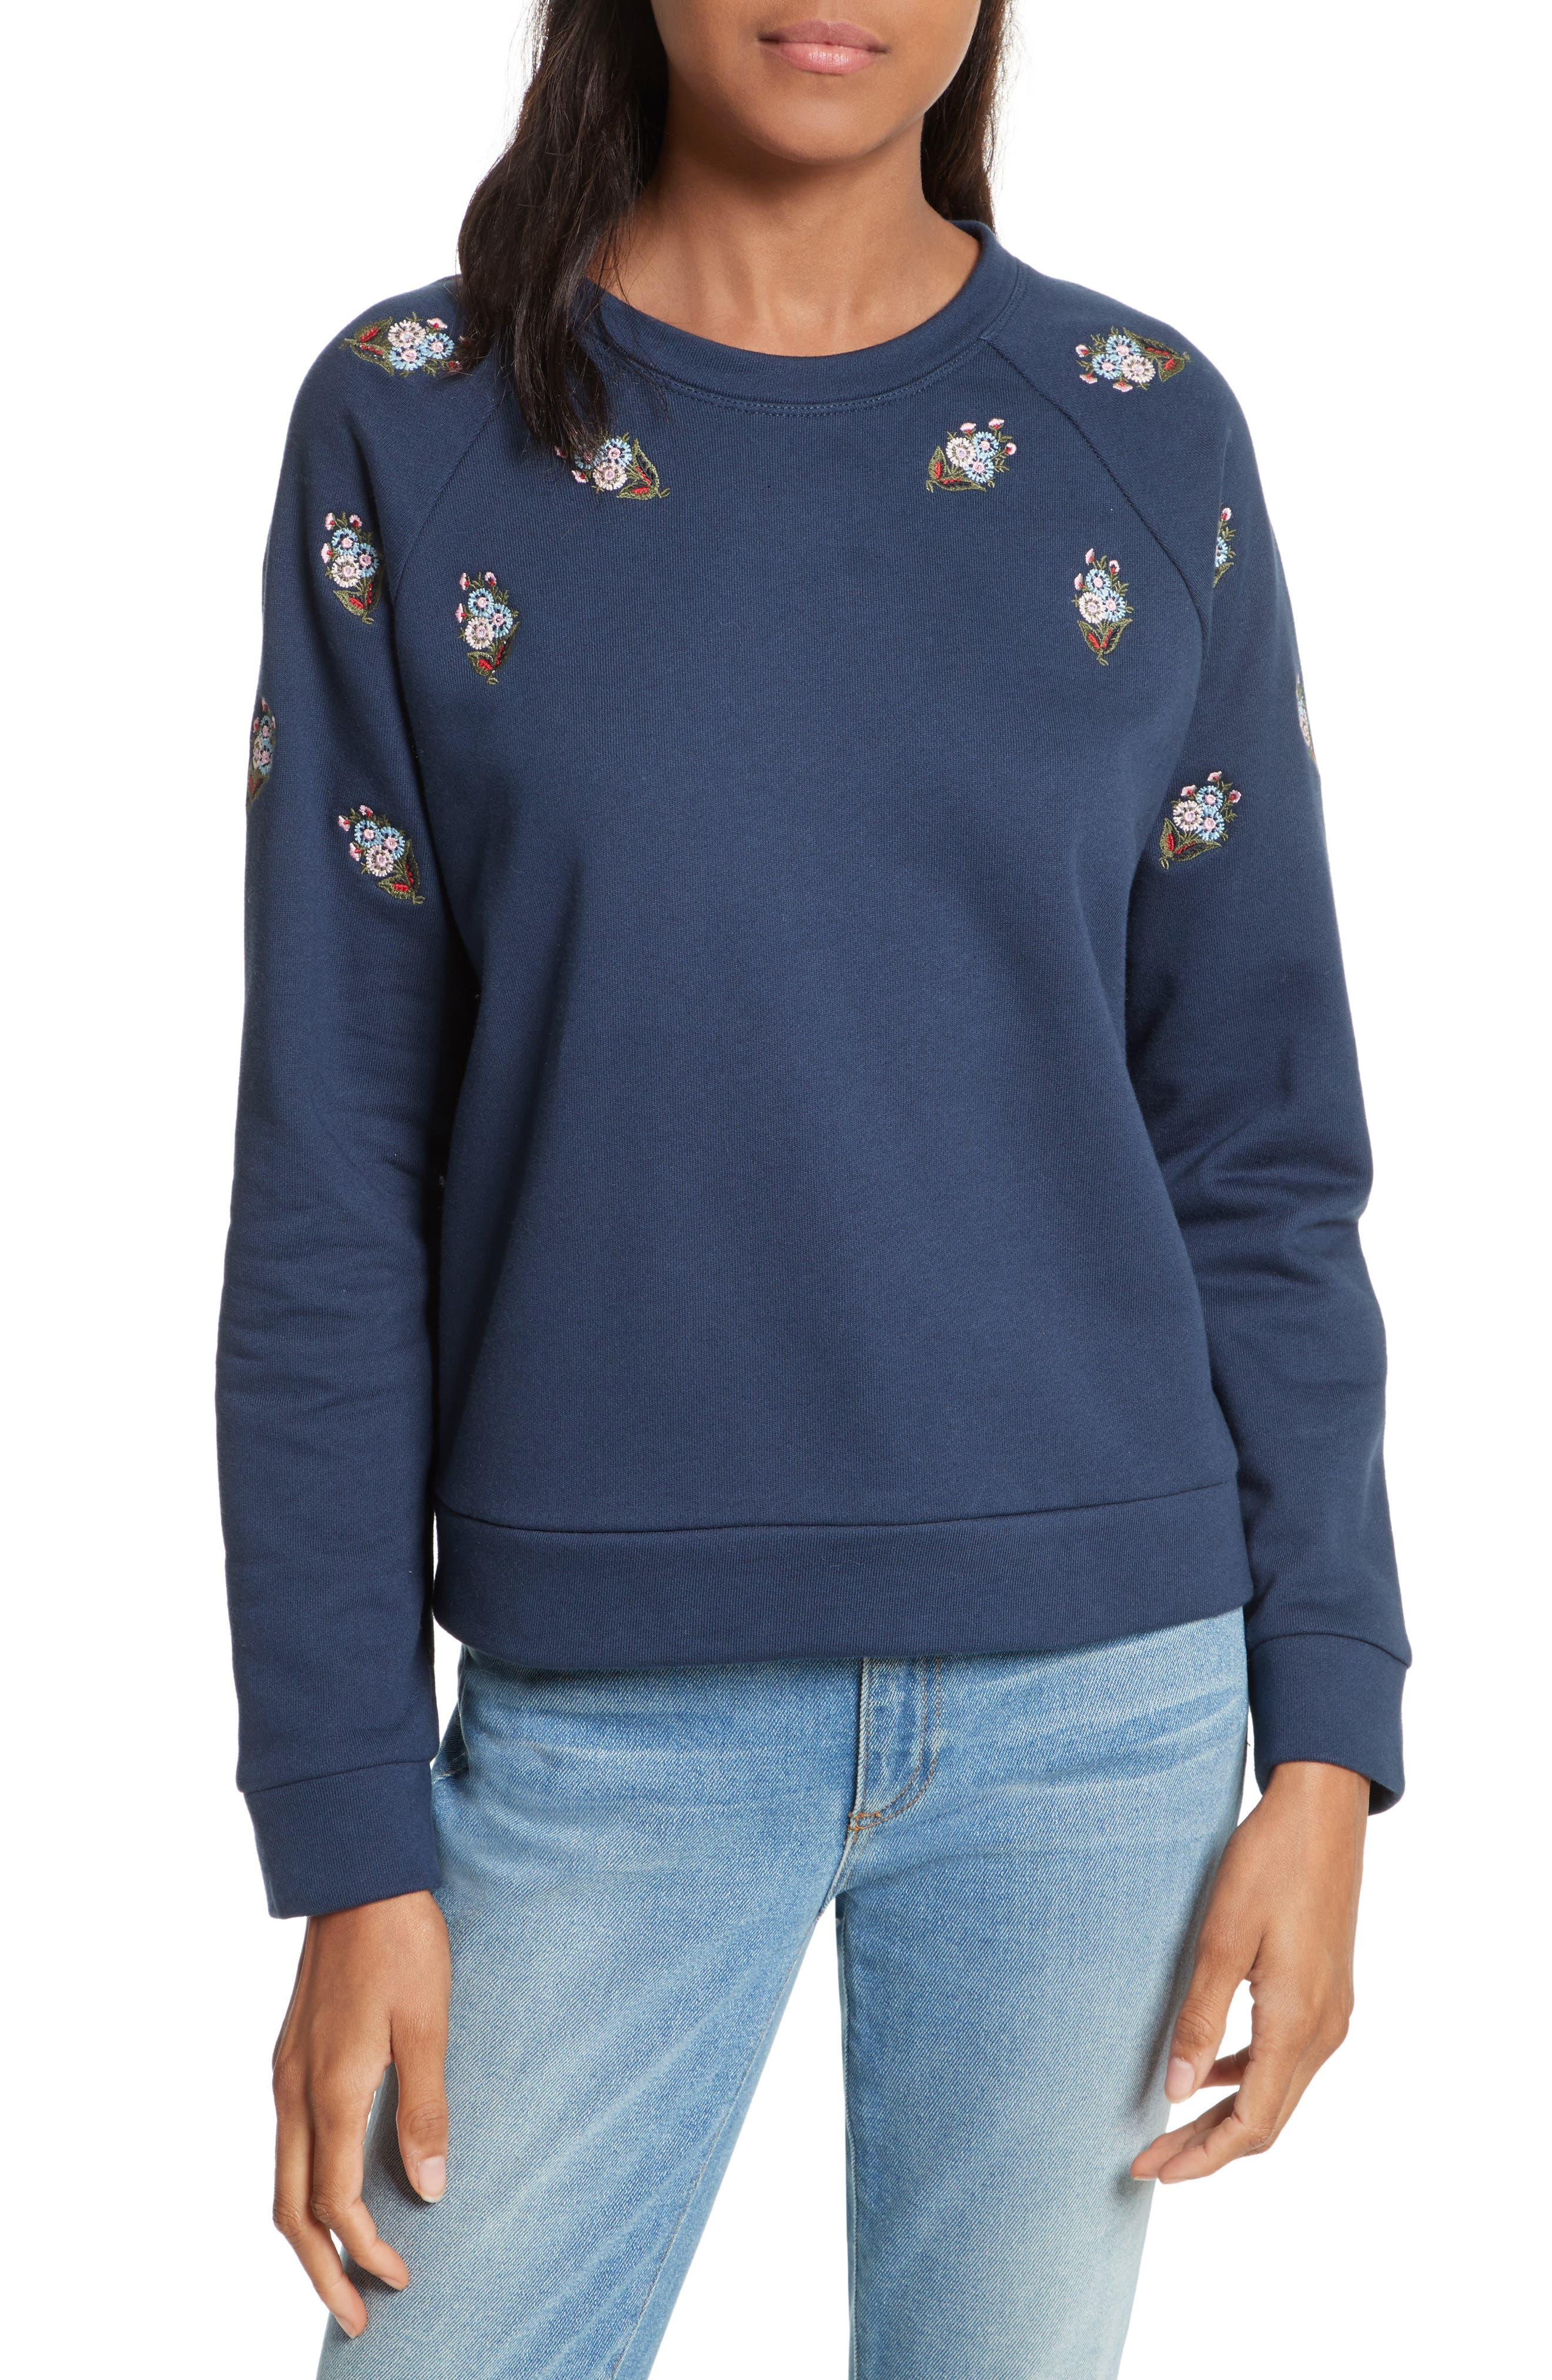 Rebecca Minkoff Antonia Embroidered Sweatshirt